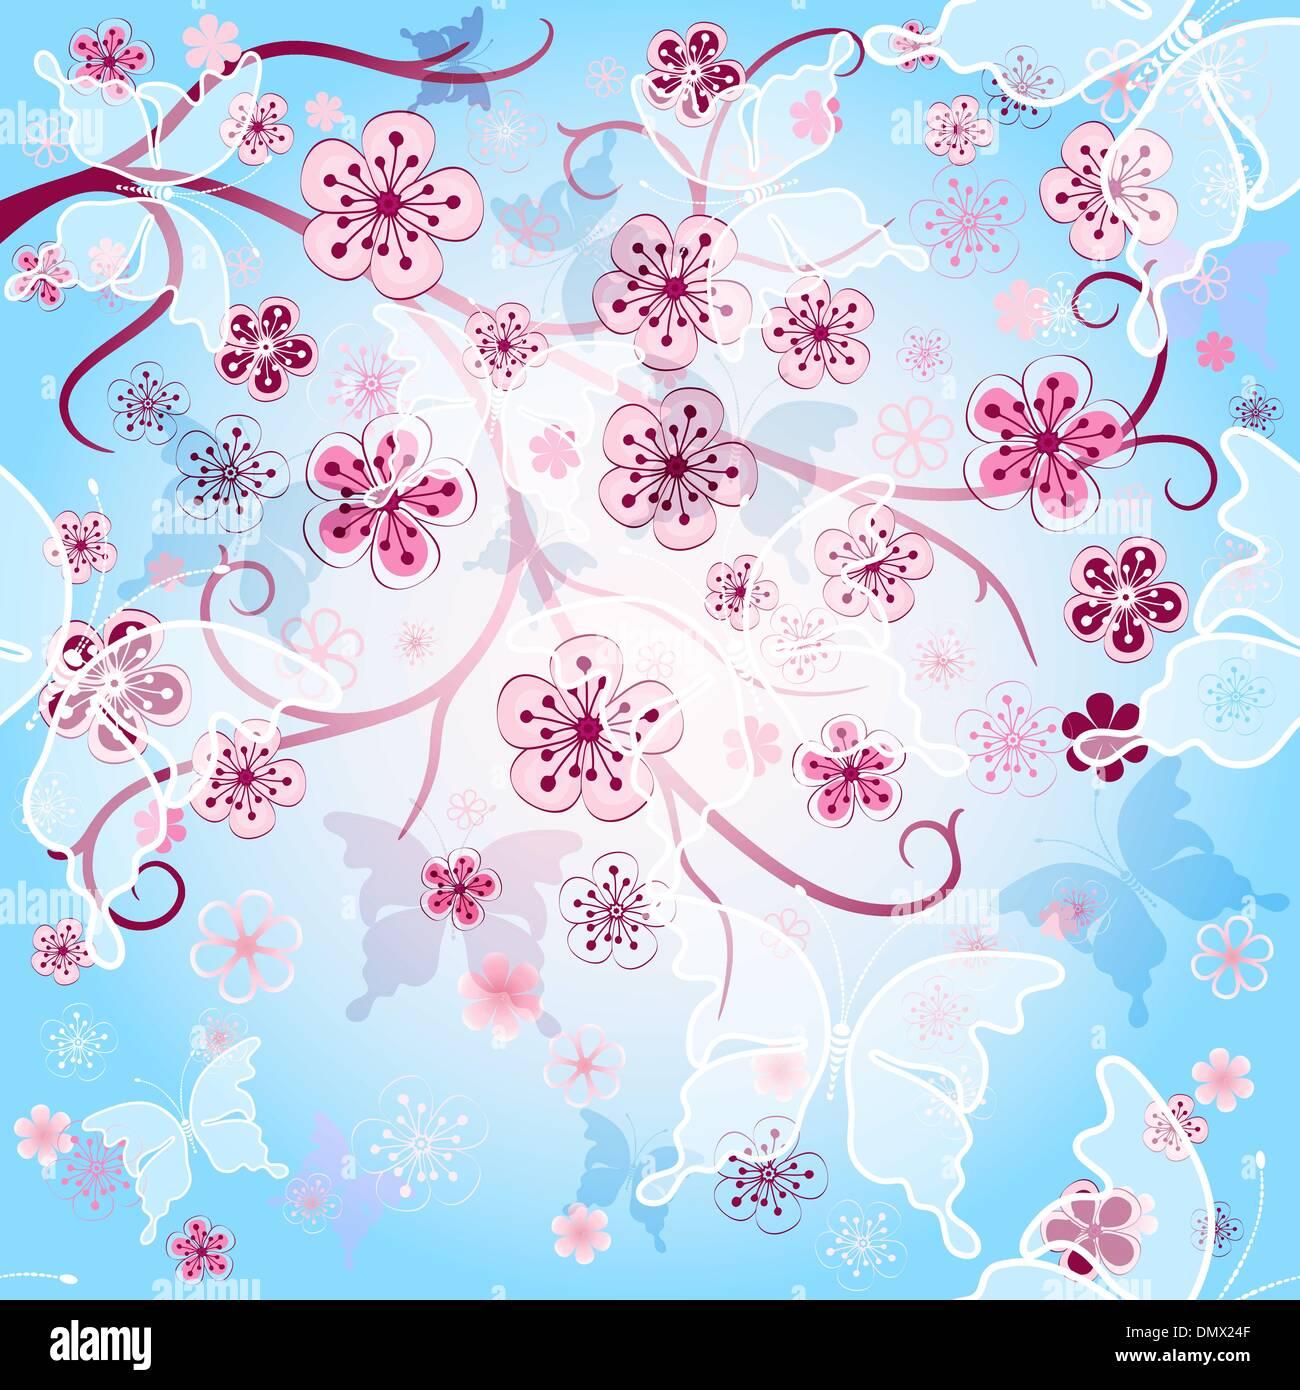 Spring gentle background - Stock Image